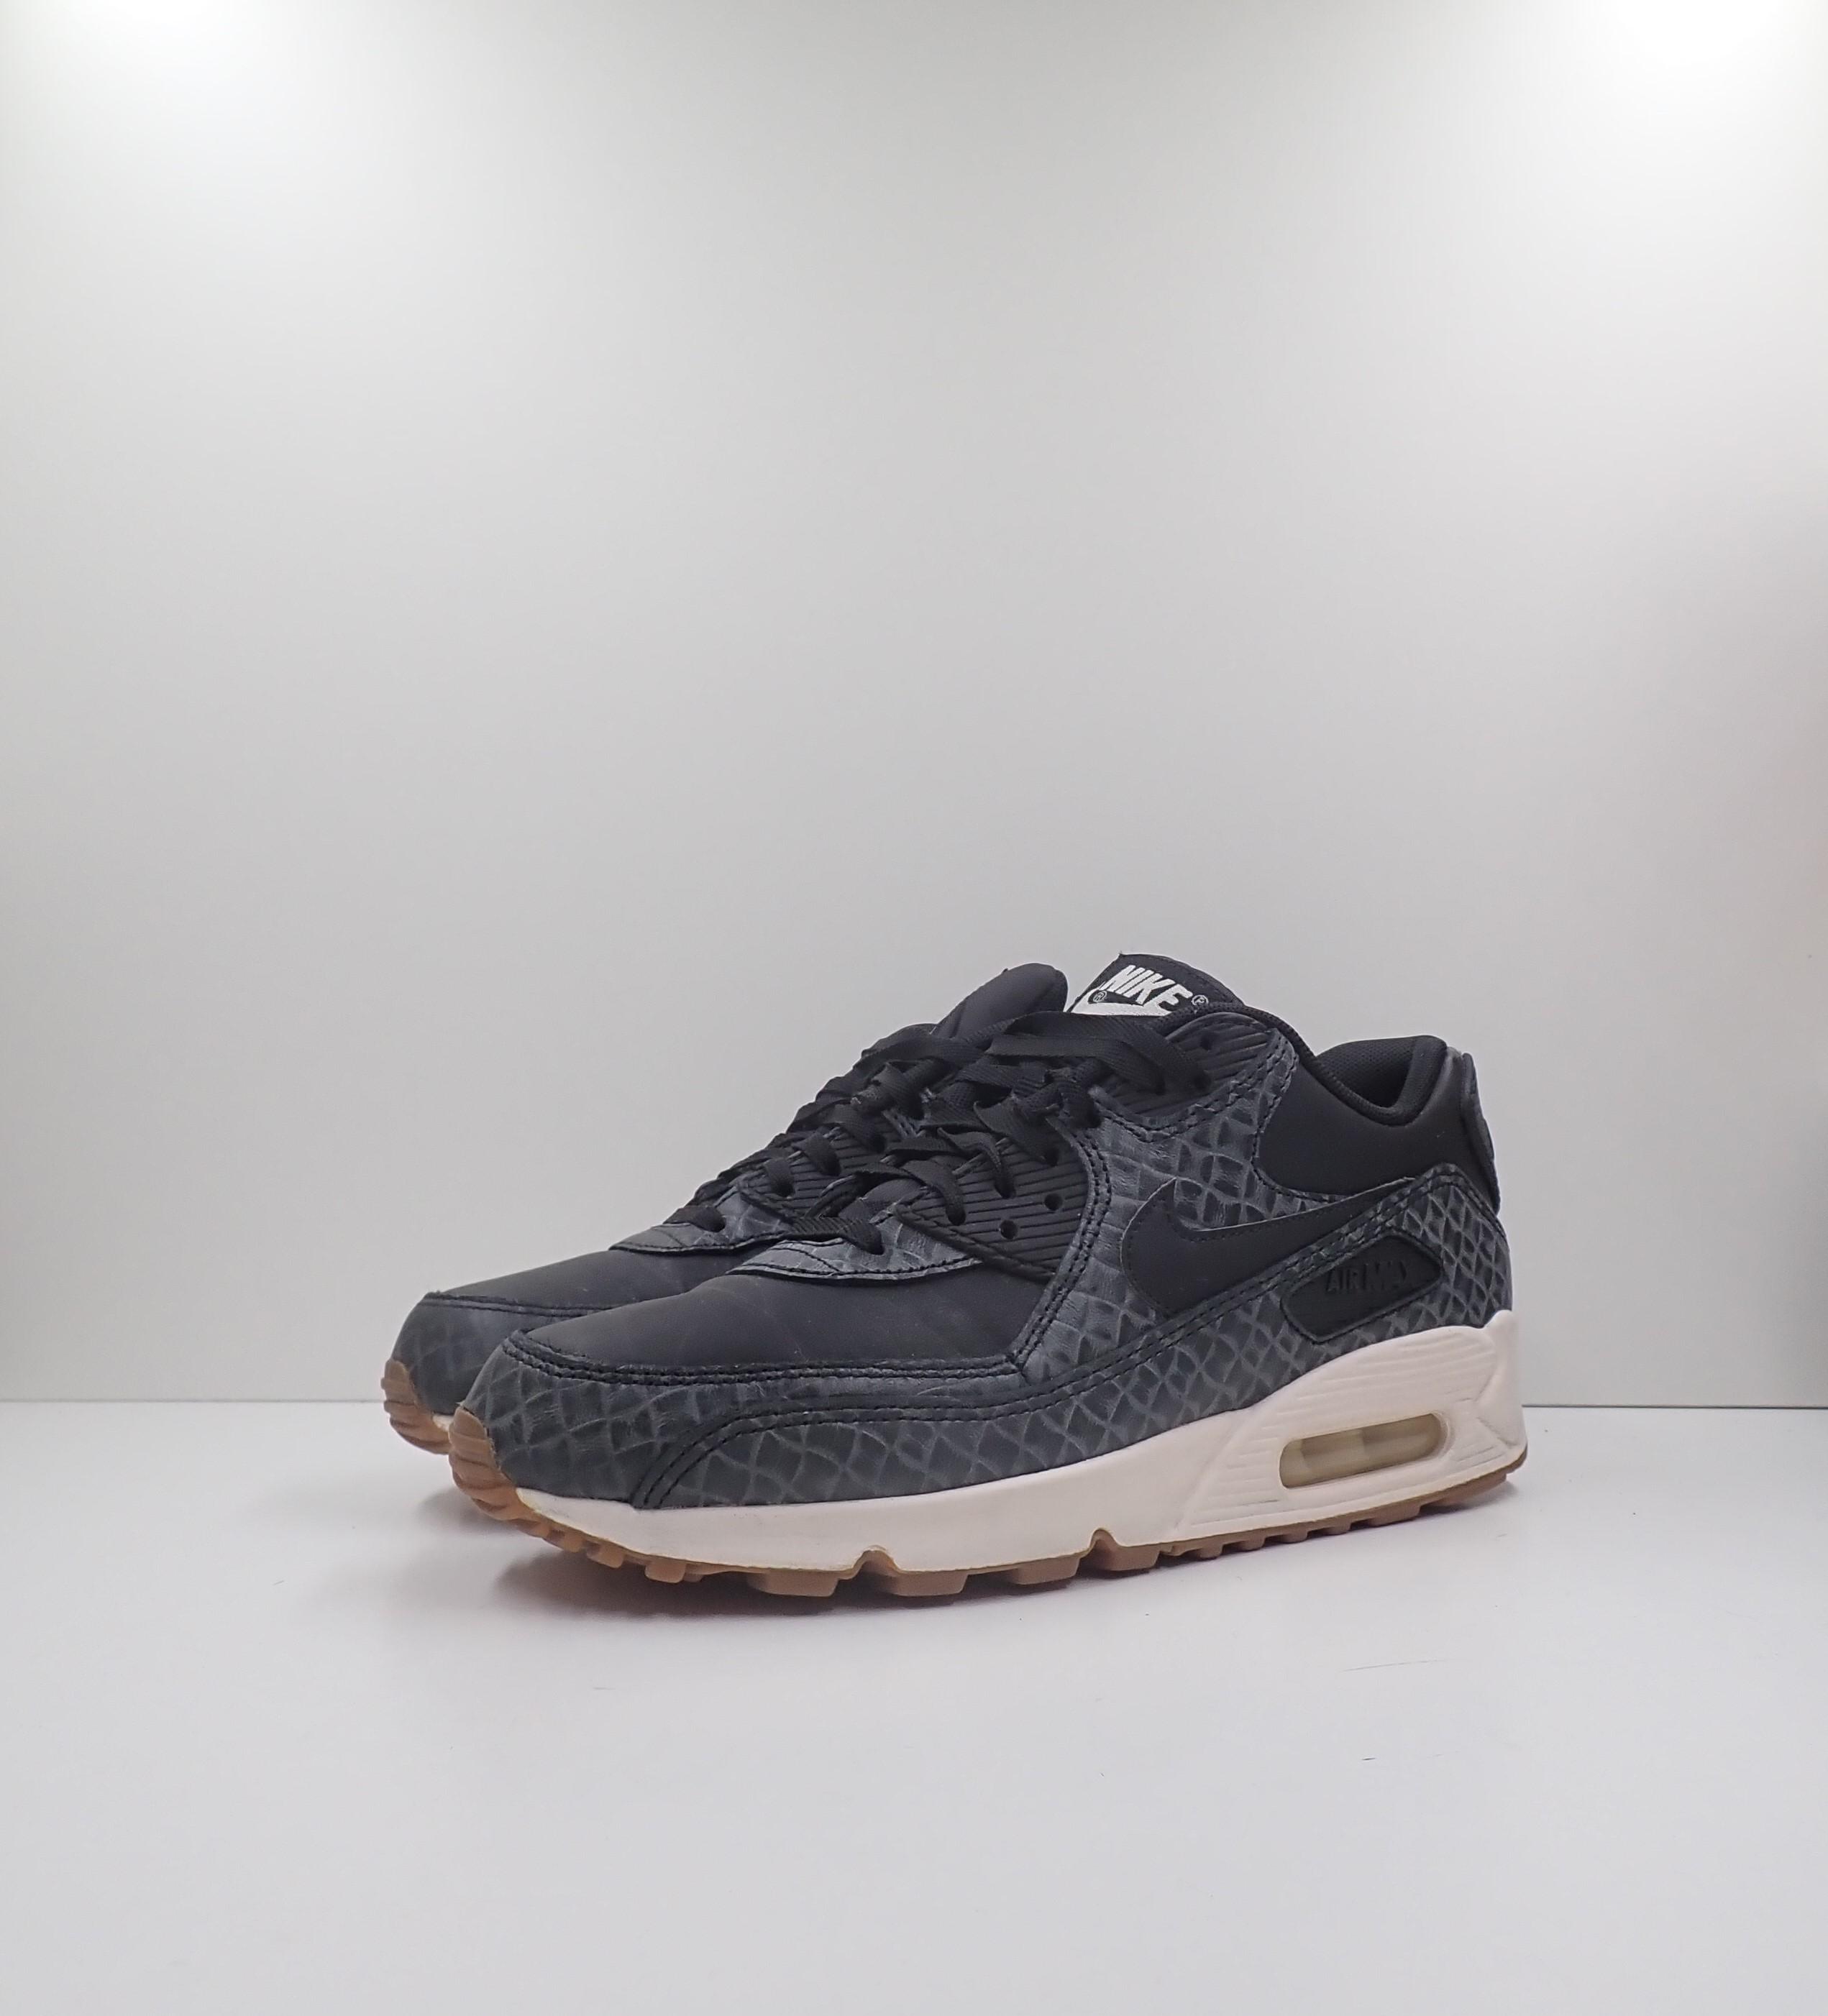 Nike Wmns Air Max 90 Premium Low Black